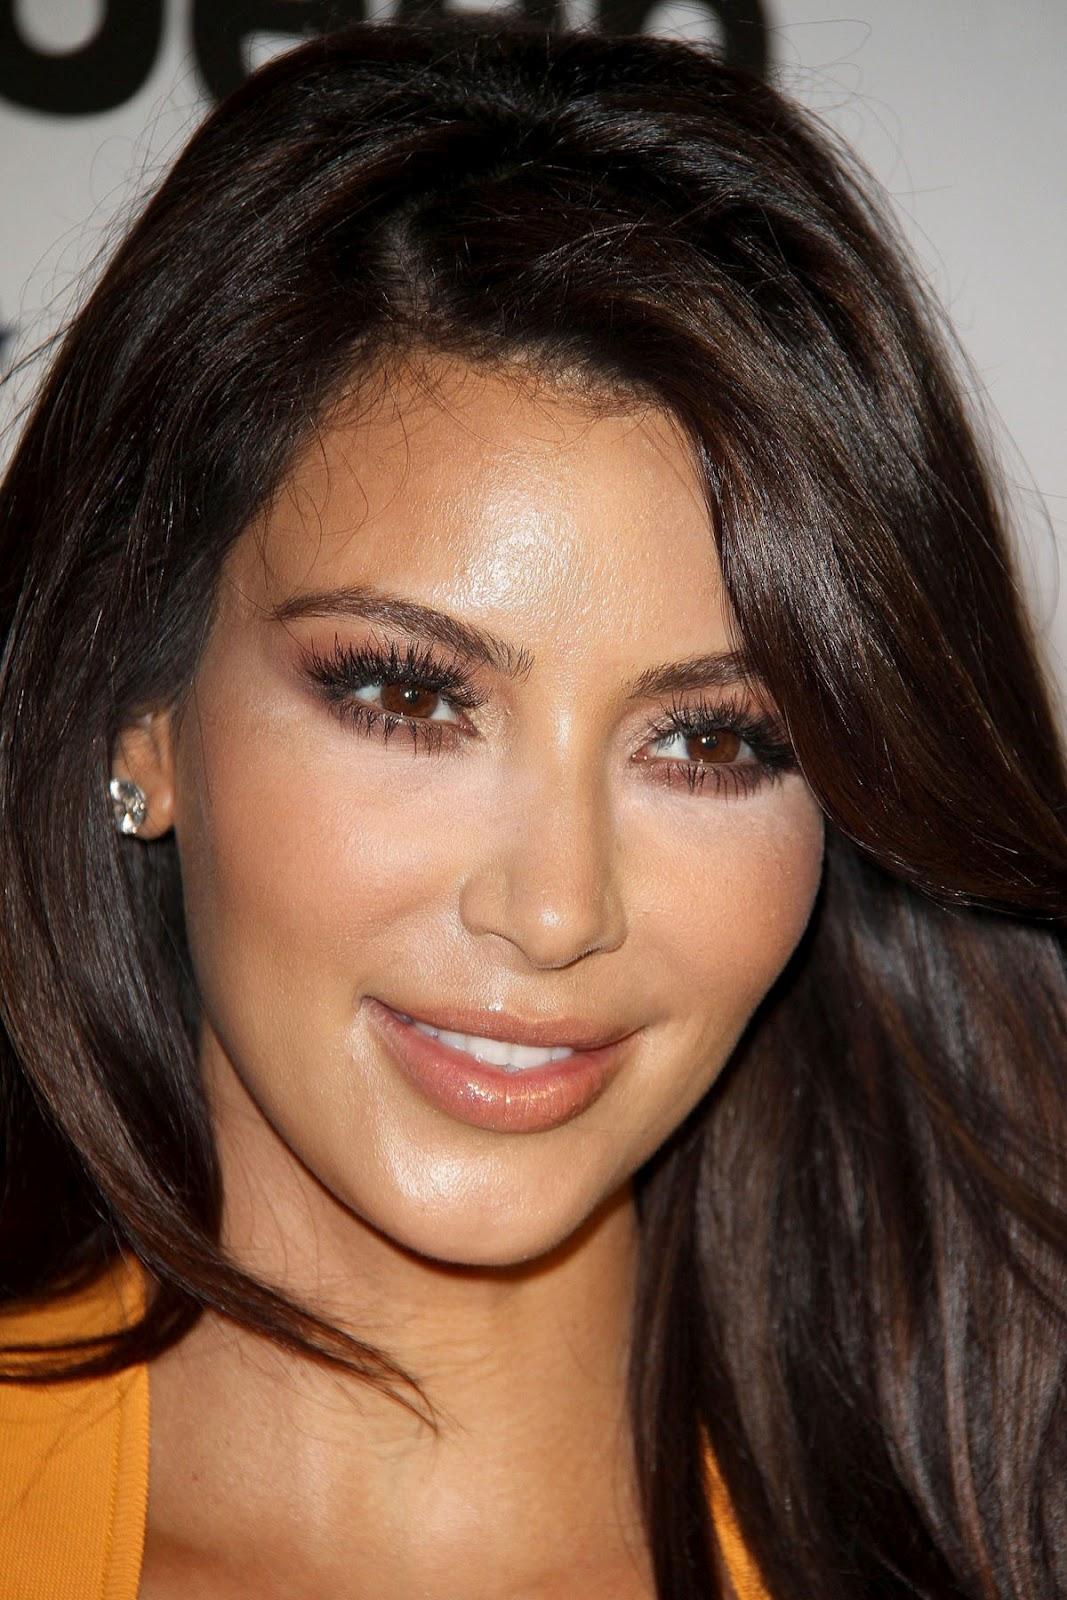 http://4.bp.blogspot.com/-B00seqMoSlk/T5WhEt67oTI/AAAAAAAAH8o/k9so3fG8lKU/s1600/Kim-Kardashian-Power-Foward-Partnership-Event-6b.jpg